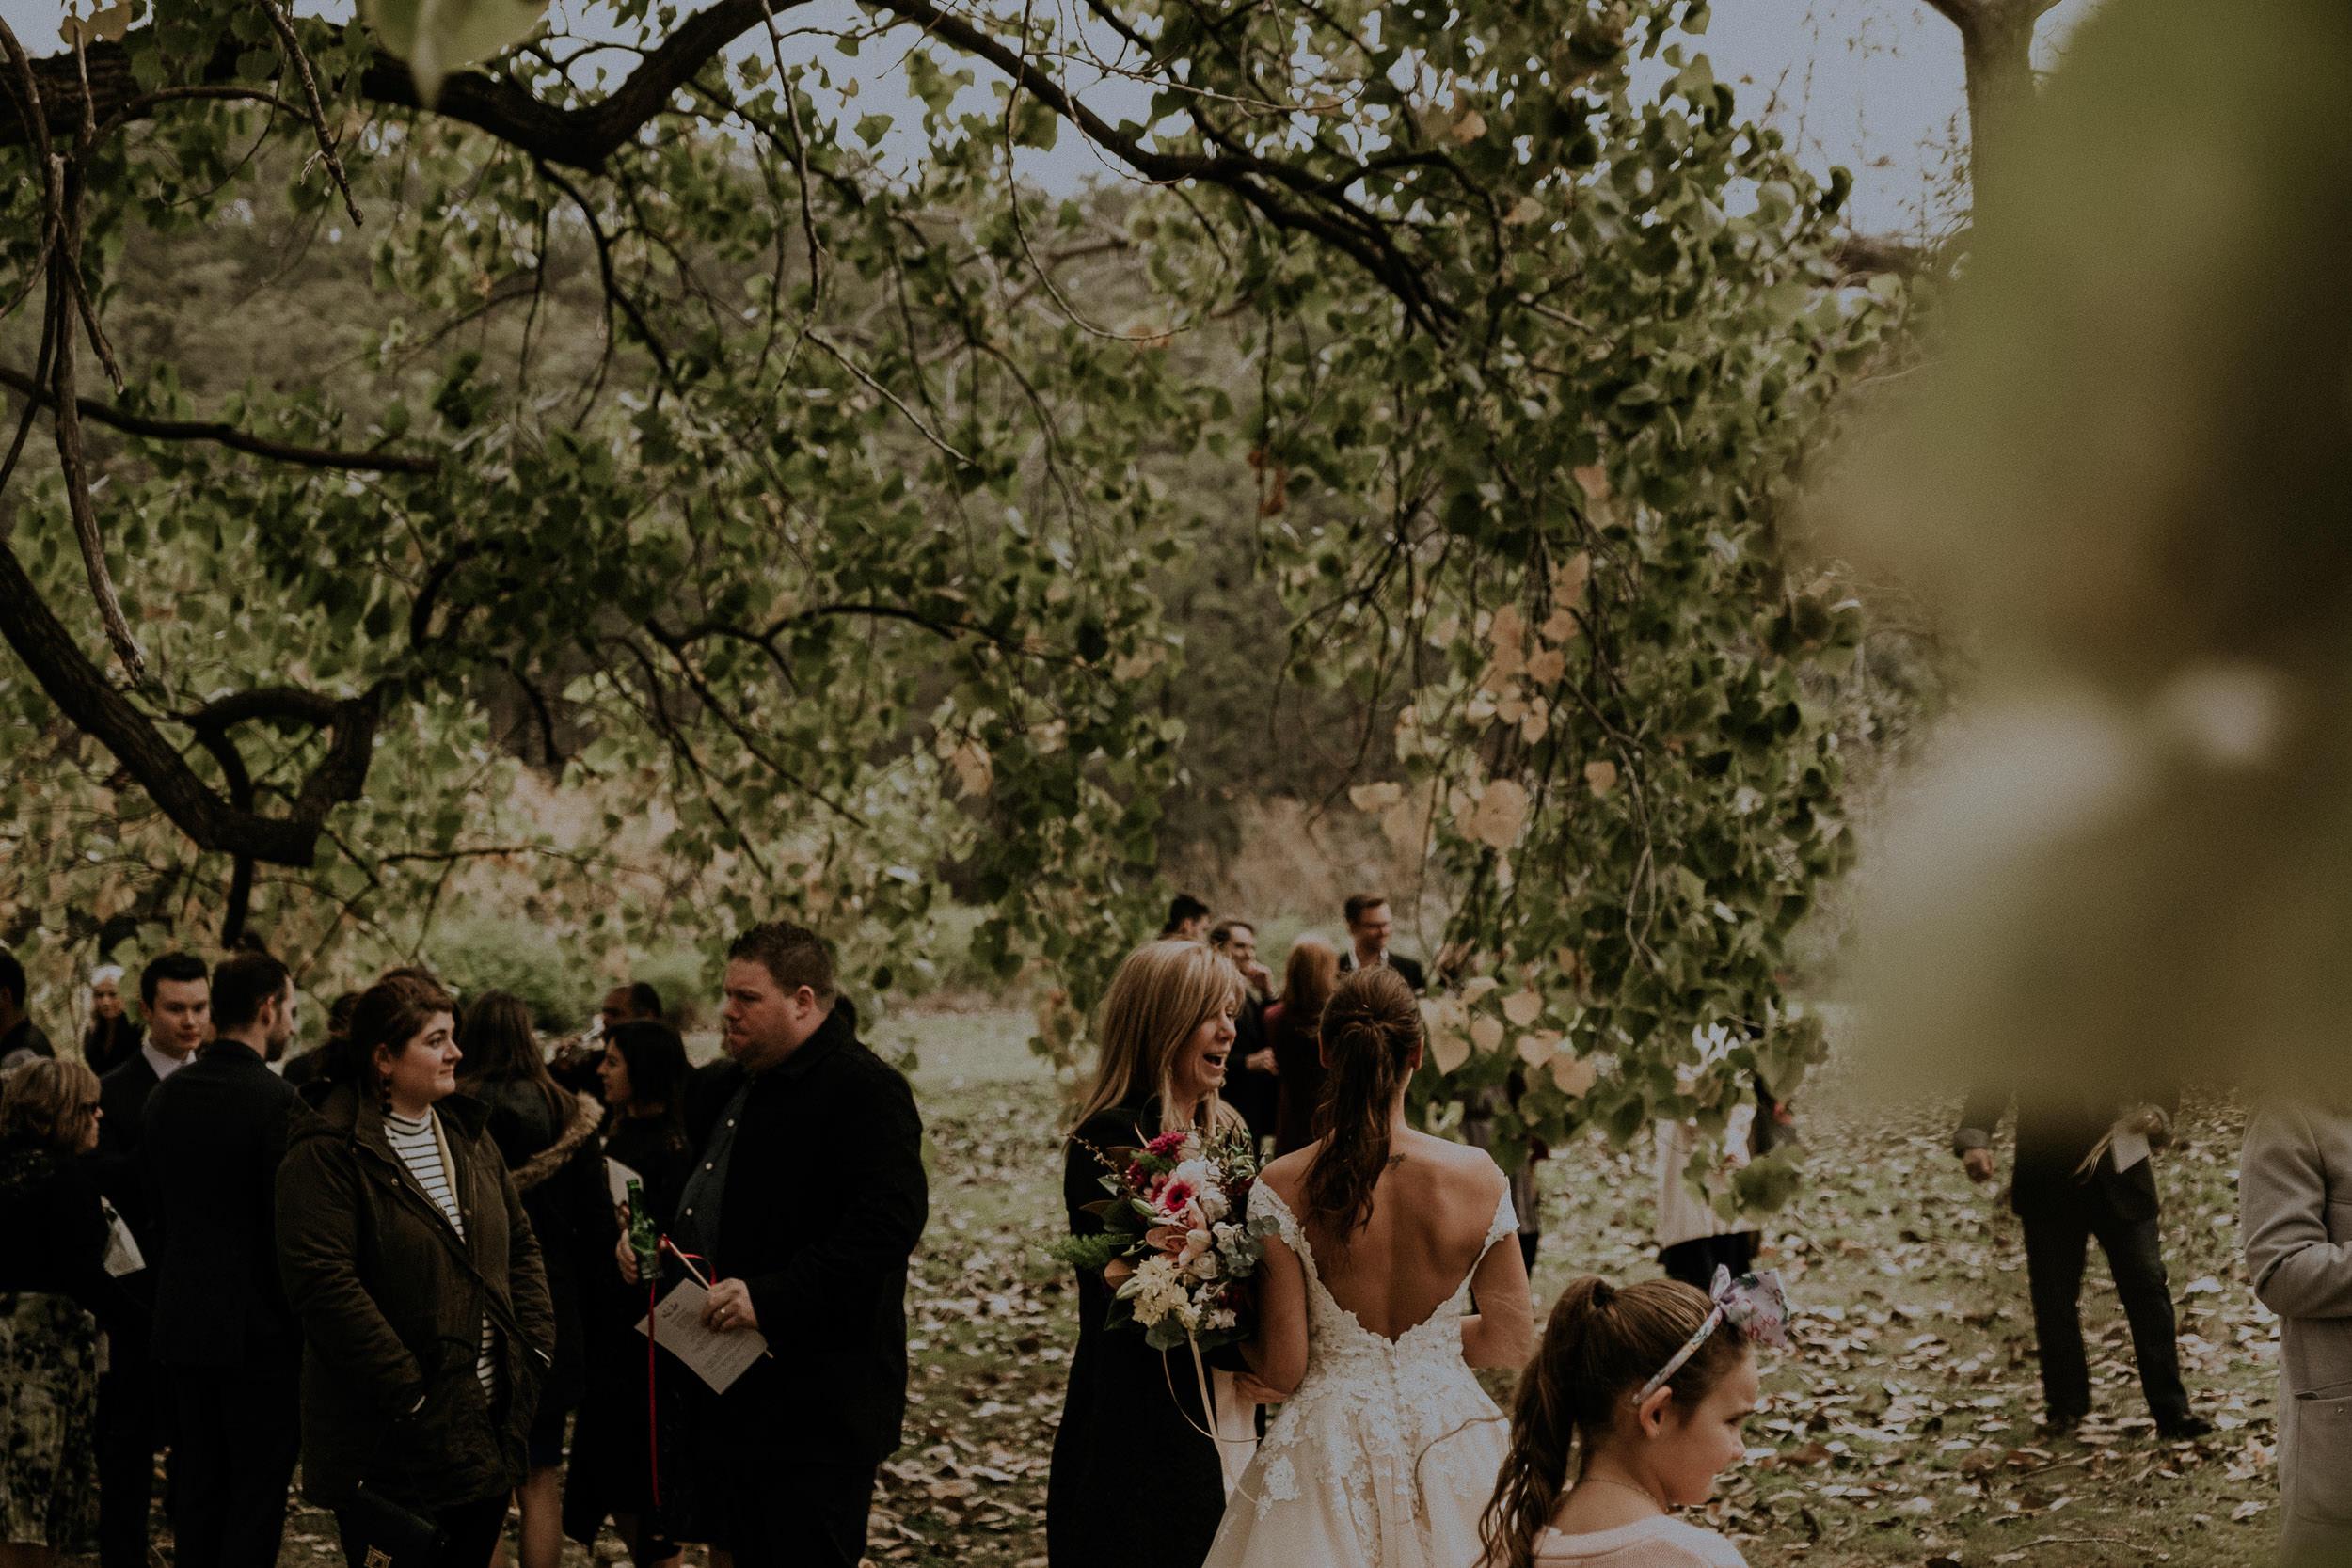 g_c wedding - kings _ thieves elopement wedding photography - blog 68.jpg